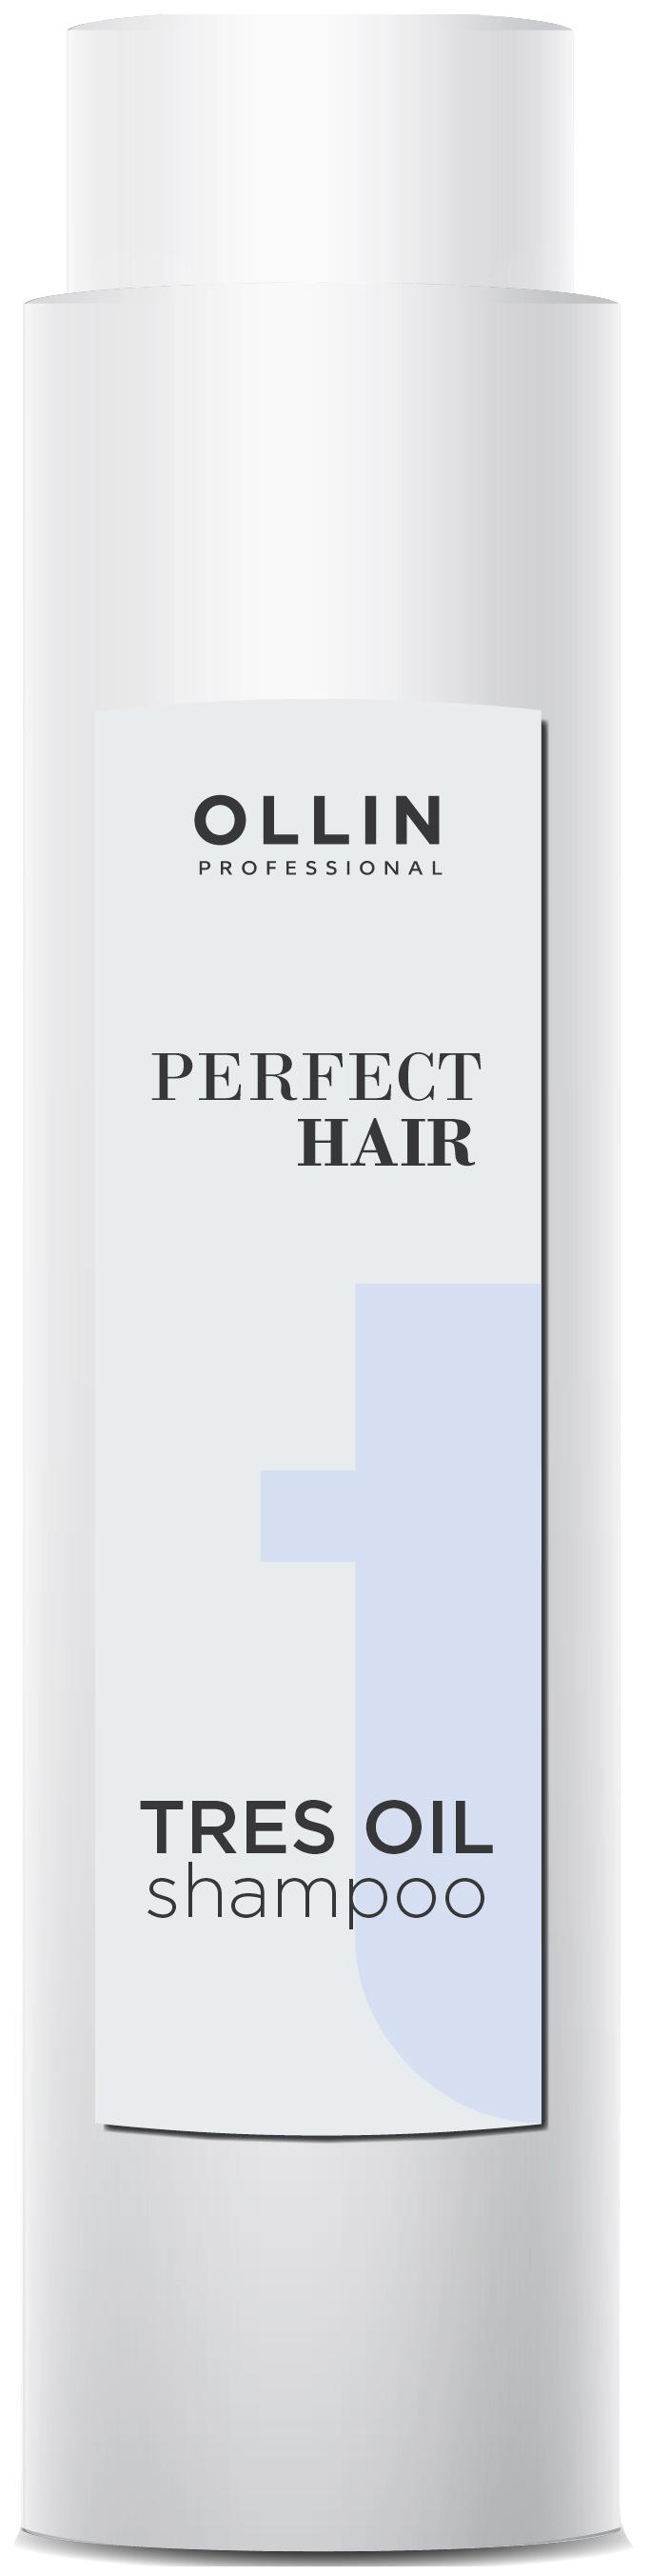 Шампунь Ollin Professional Perfect Hair Tres Oil Shampoo 400 мл